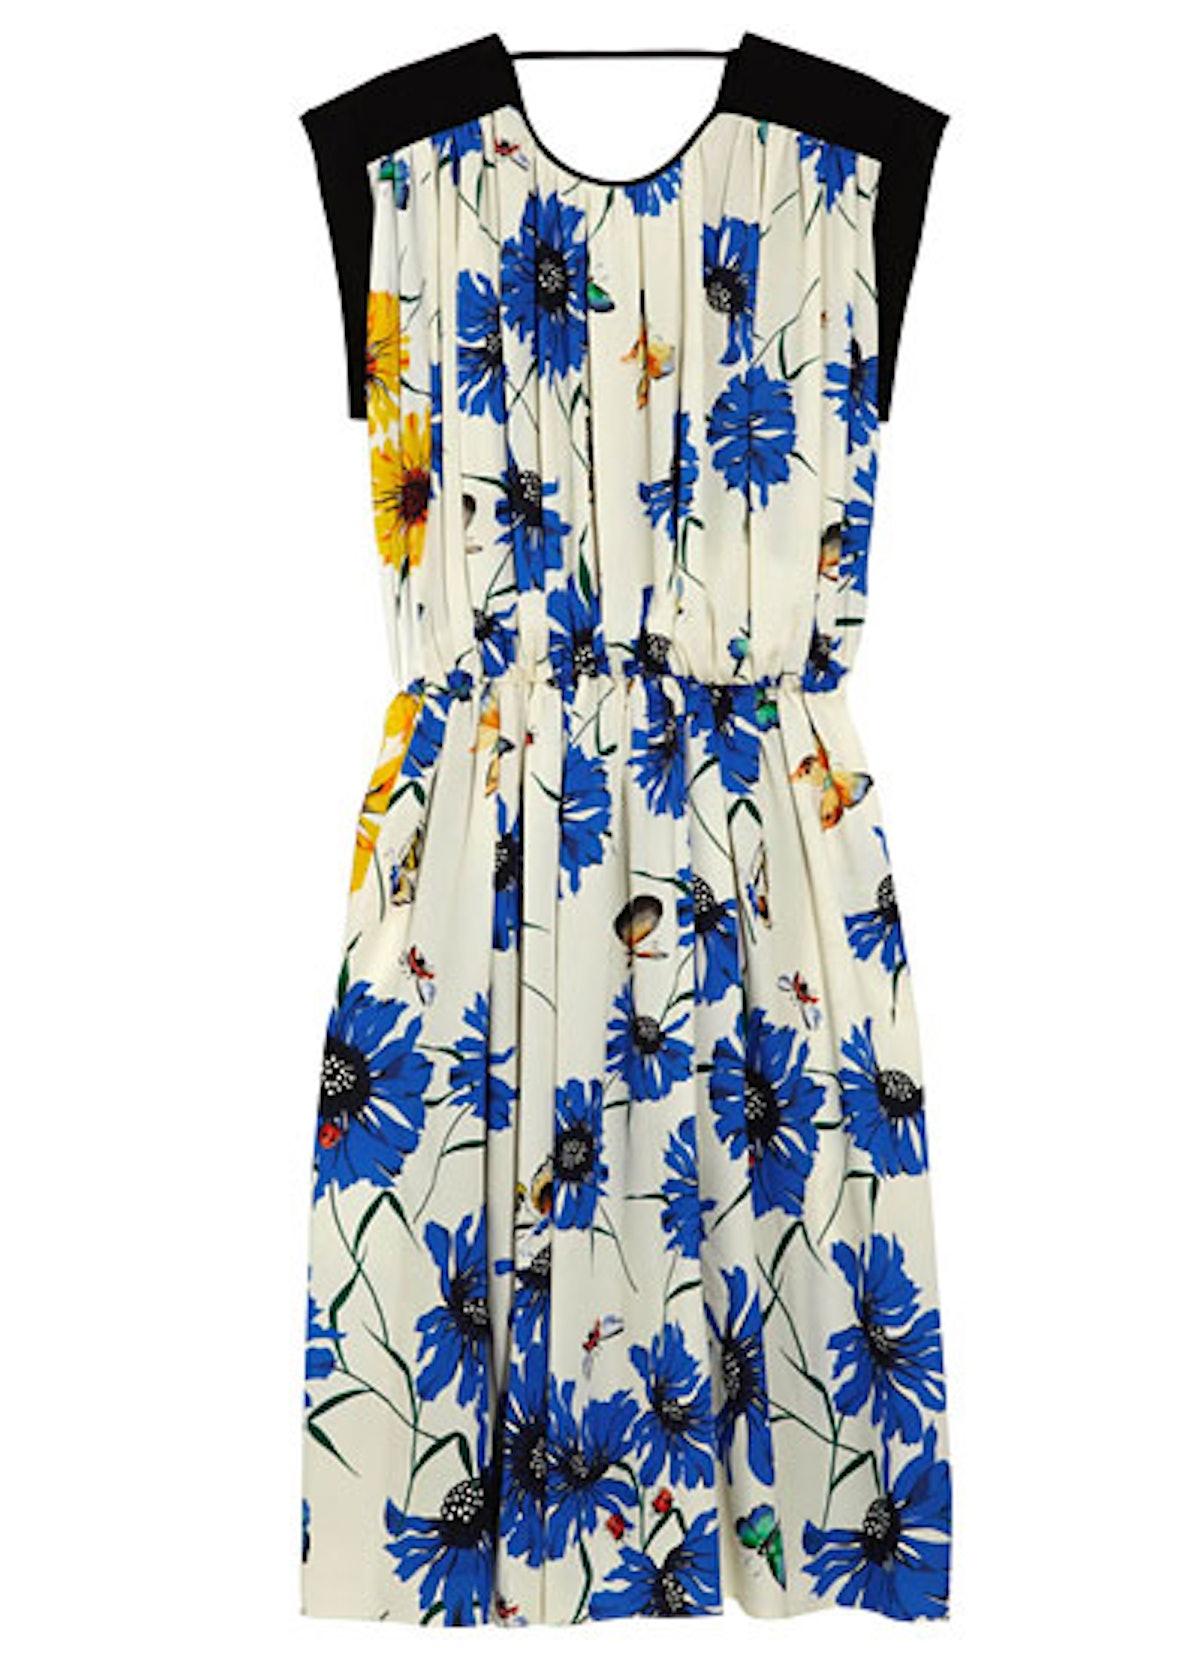 fass-floral-dresses-07-v.jpg